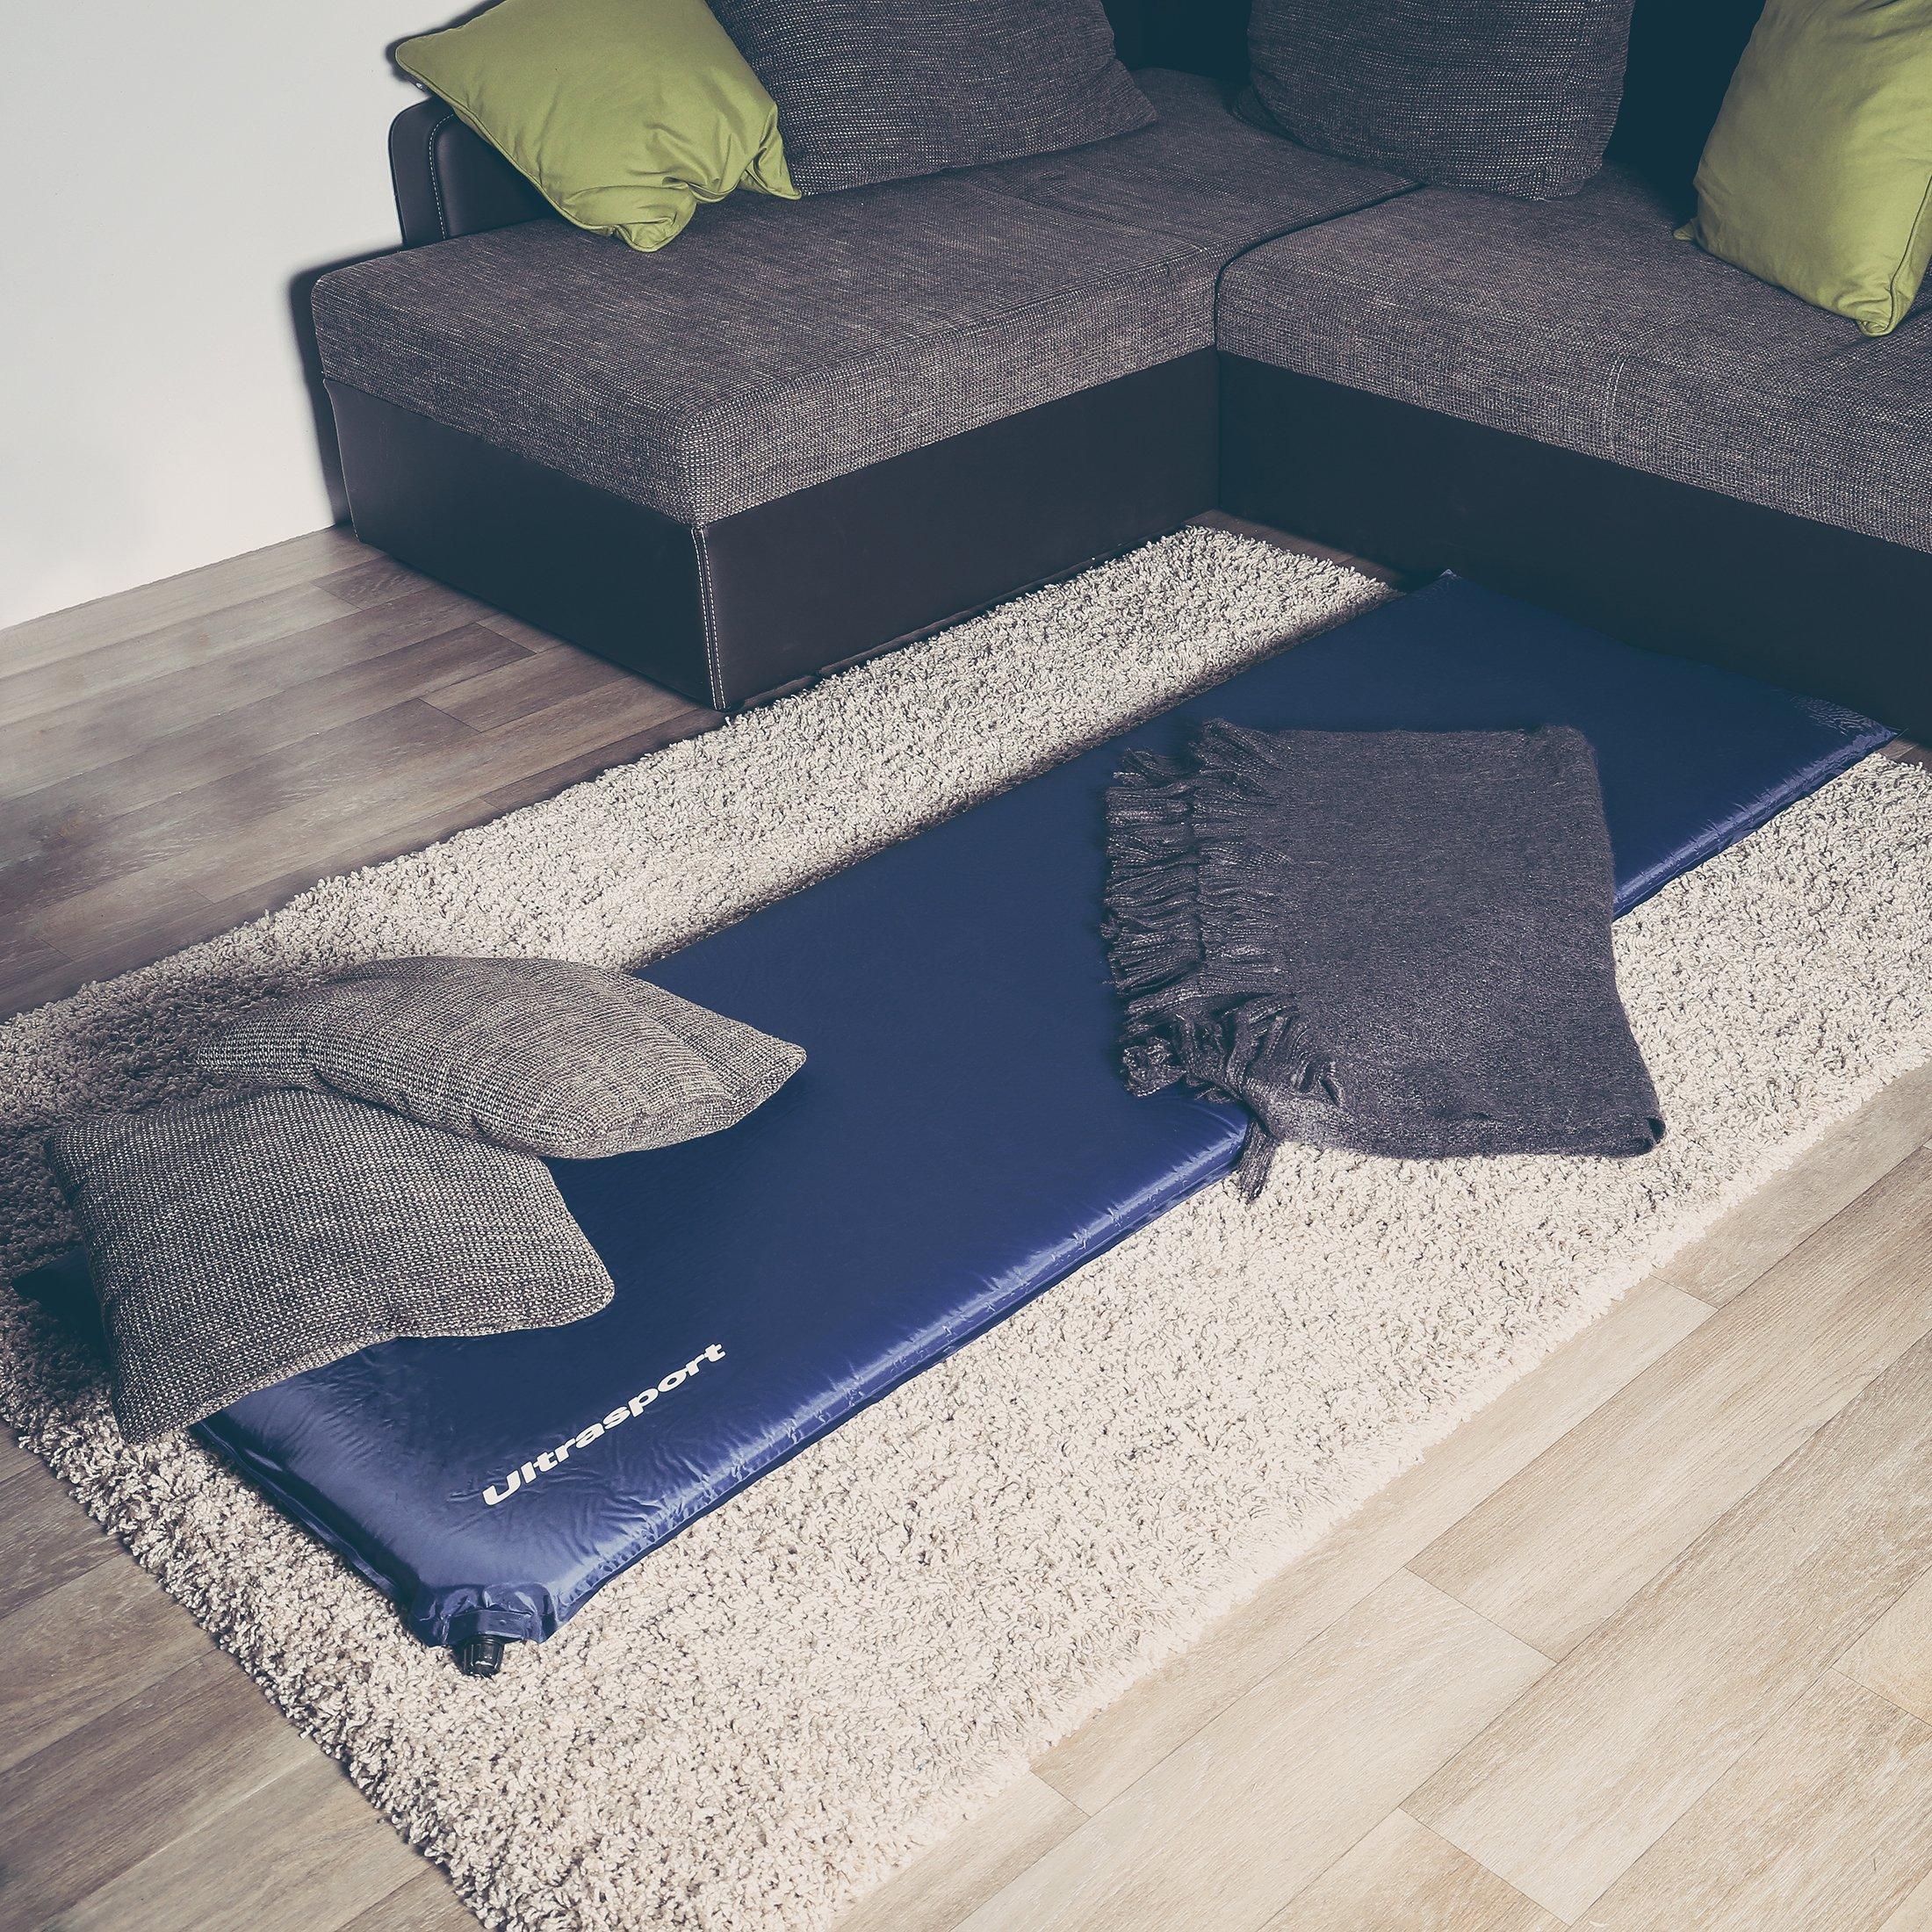 ultrasport matelas d isolation auto gonflable matelas. Black Bedroom Furniture Sets. Home Design Ideas